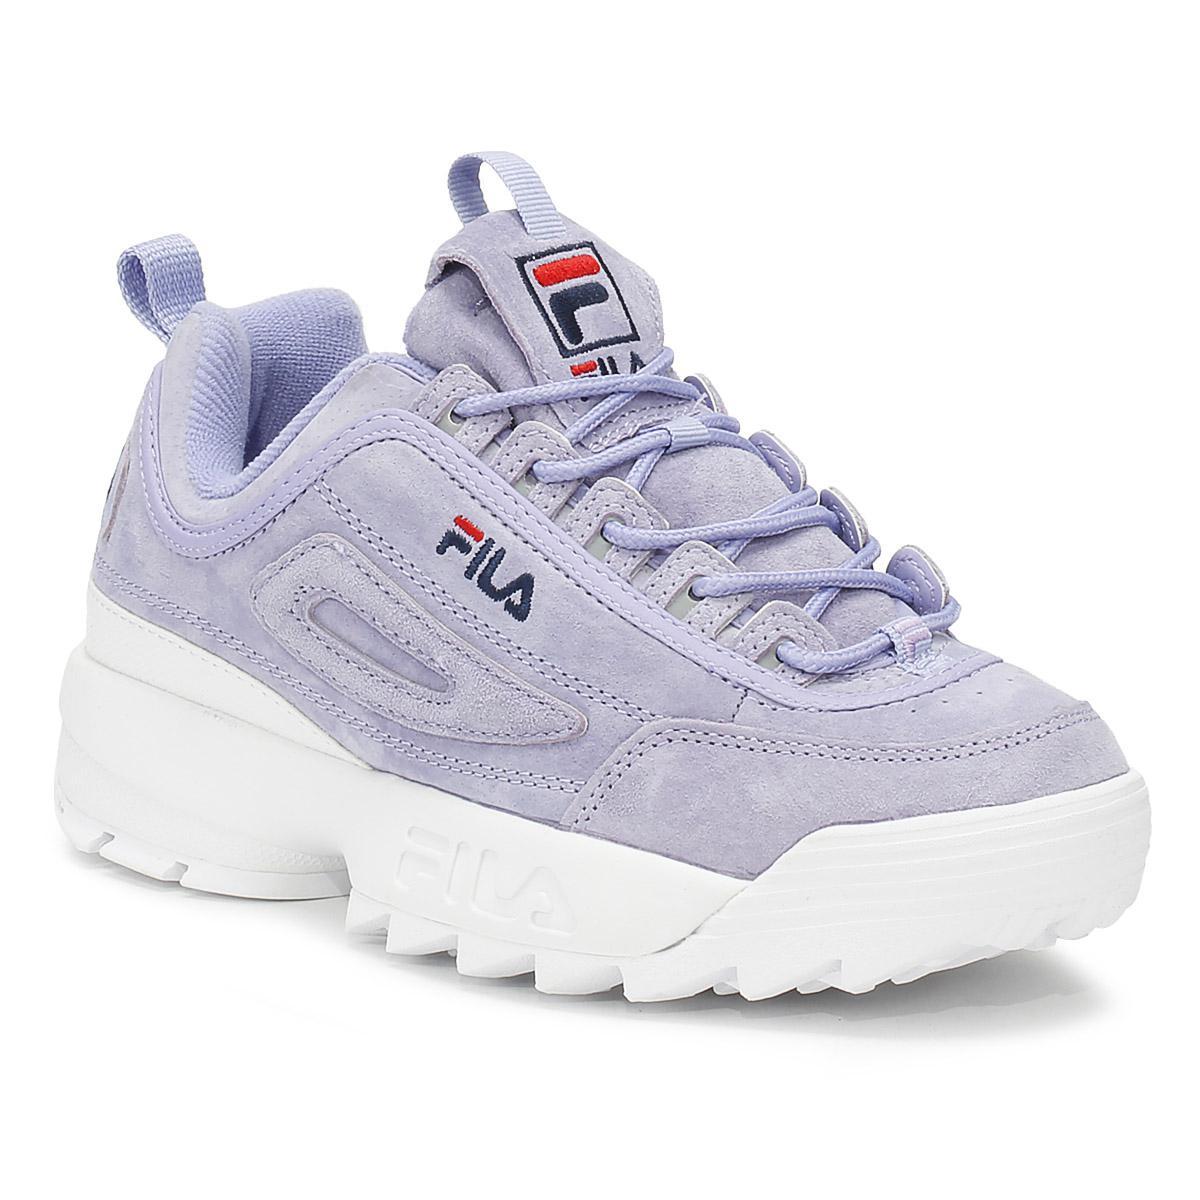 0090dba10f2 Fila Disruptor Ii Womens Sweet Lavender Premium Suede Trainers in ...